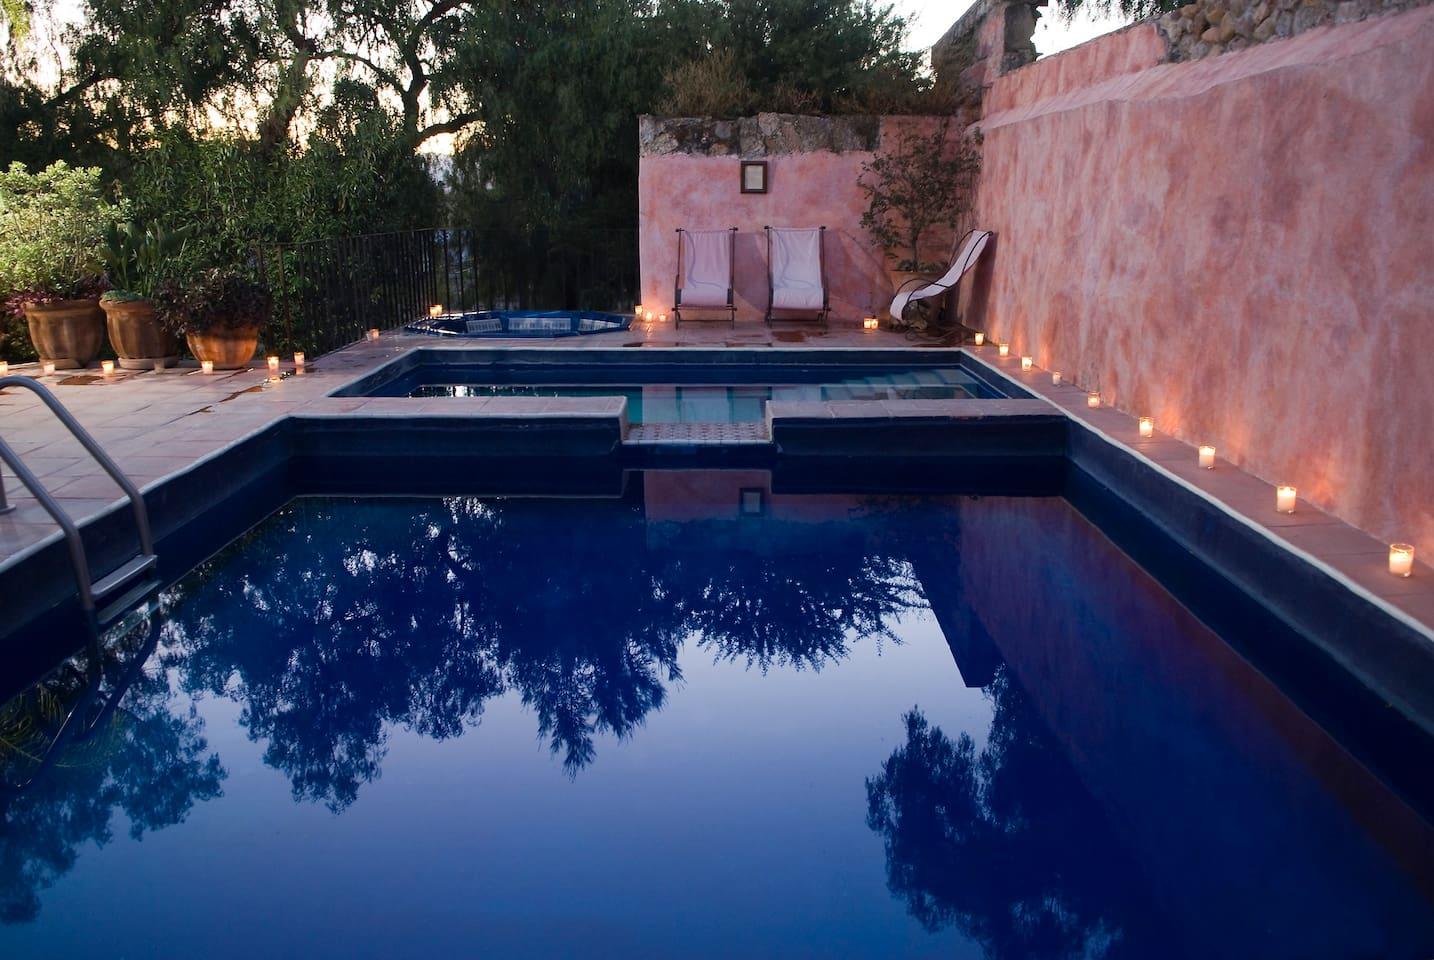 Hacienda Las Trancas Private Pool and Jacuzzi.